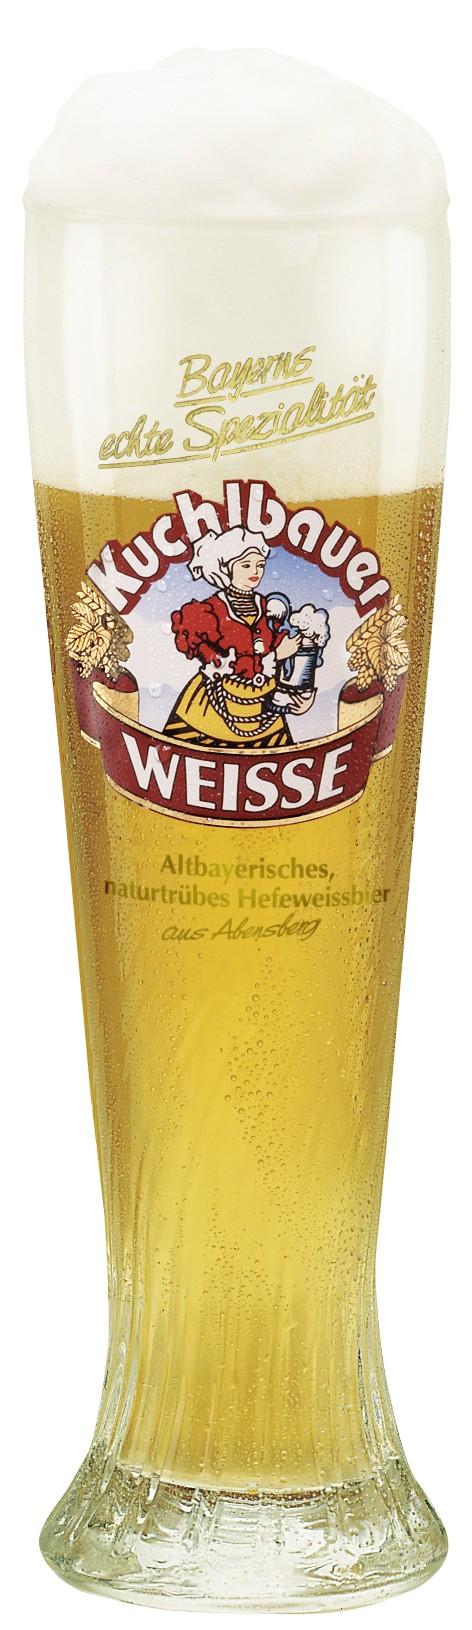 Kuchlbauer - Original Weizenglas